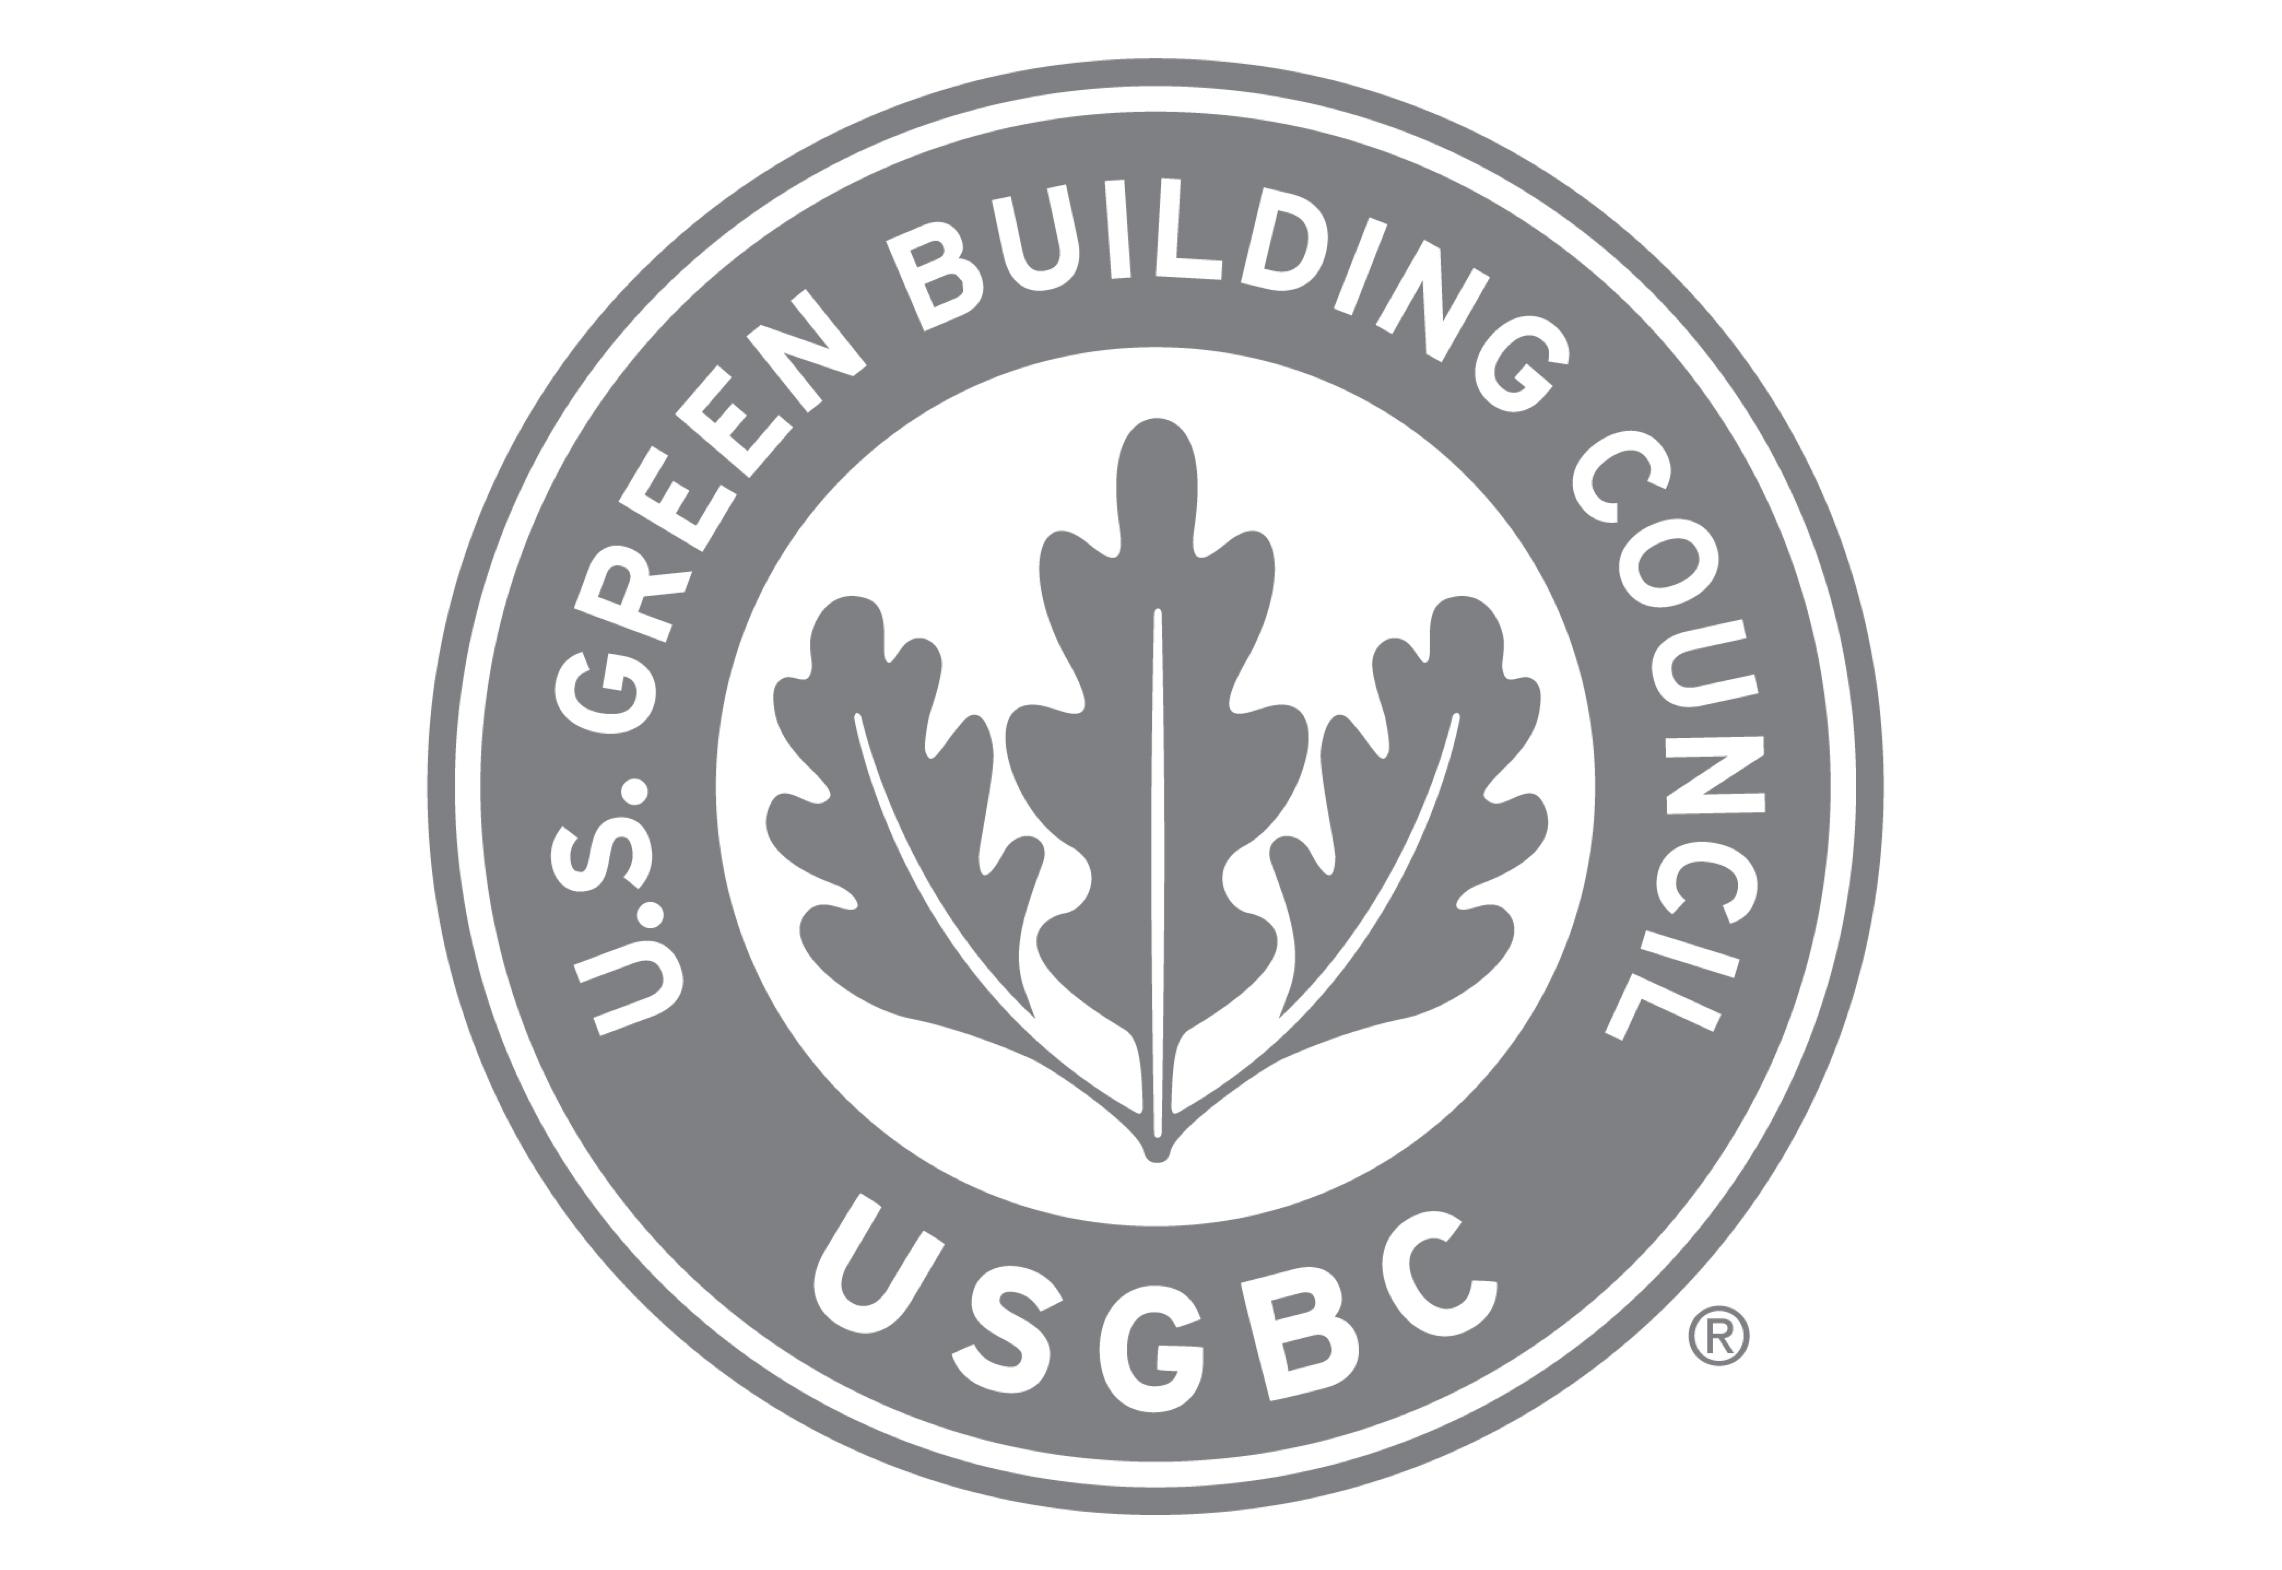 usgbc-logo-grey-3x2.jpg